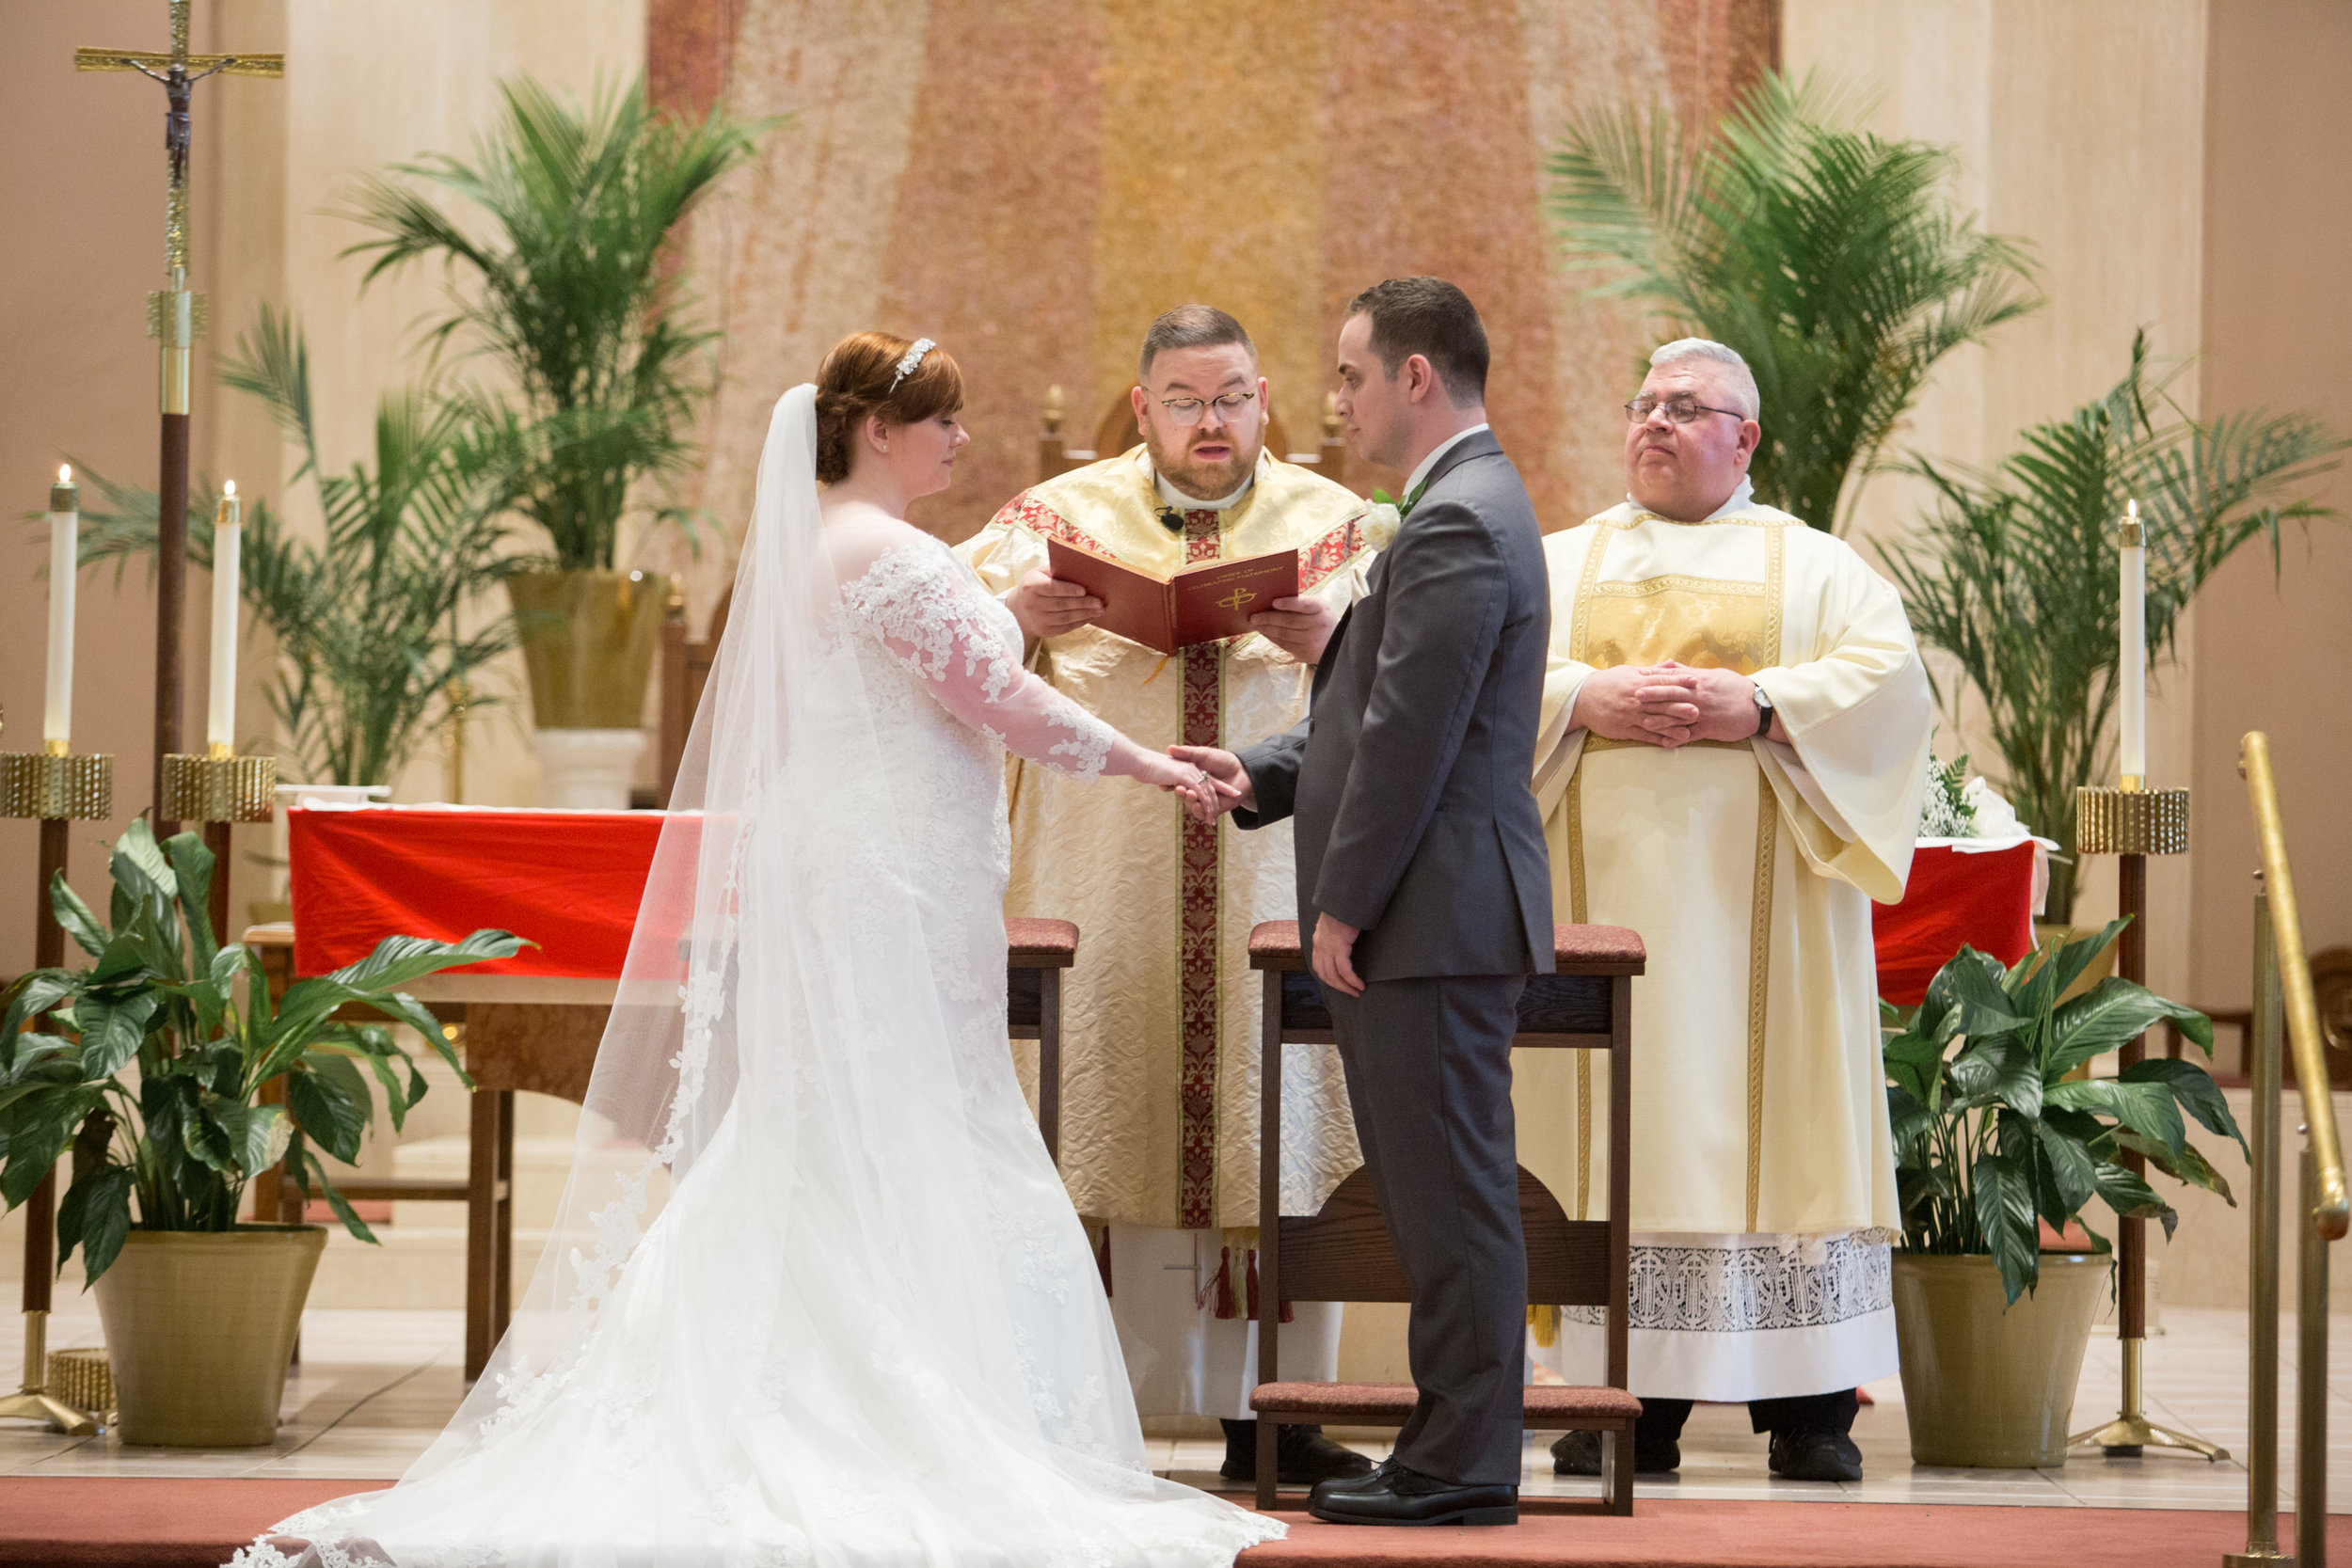 Fiorellis Wedding Photos_JDP-46.jpg